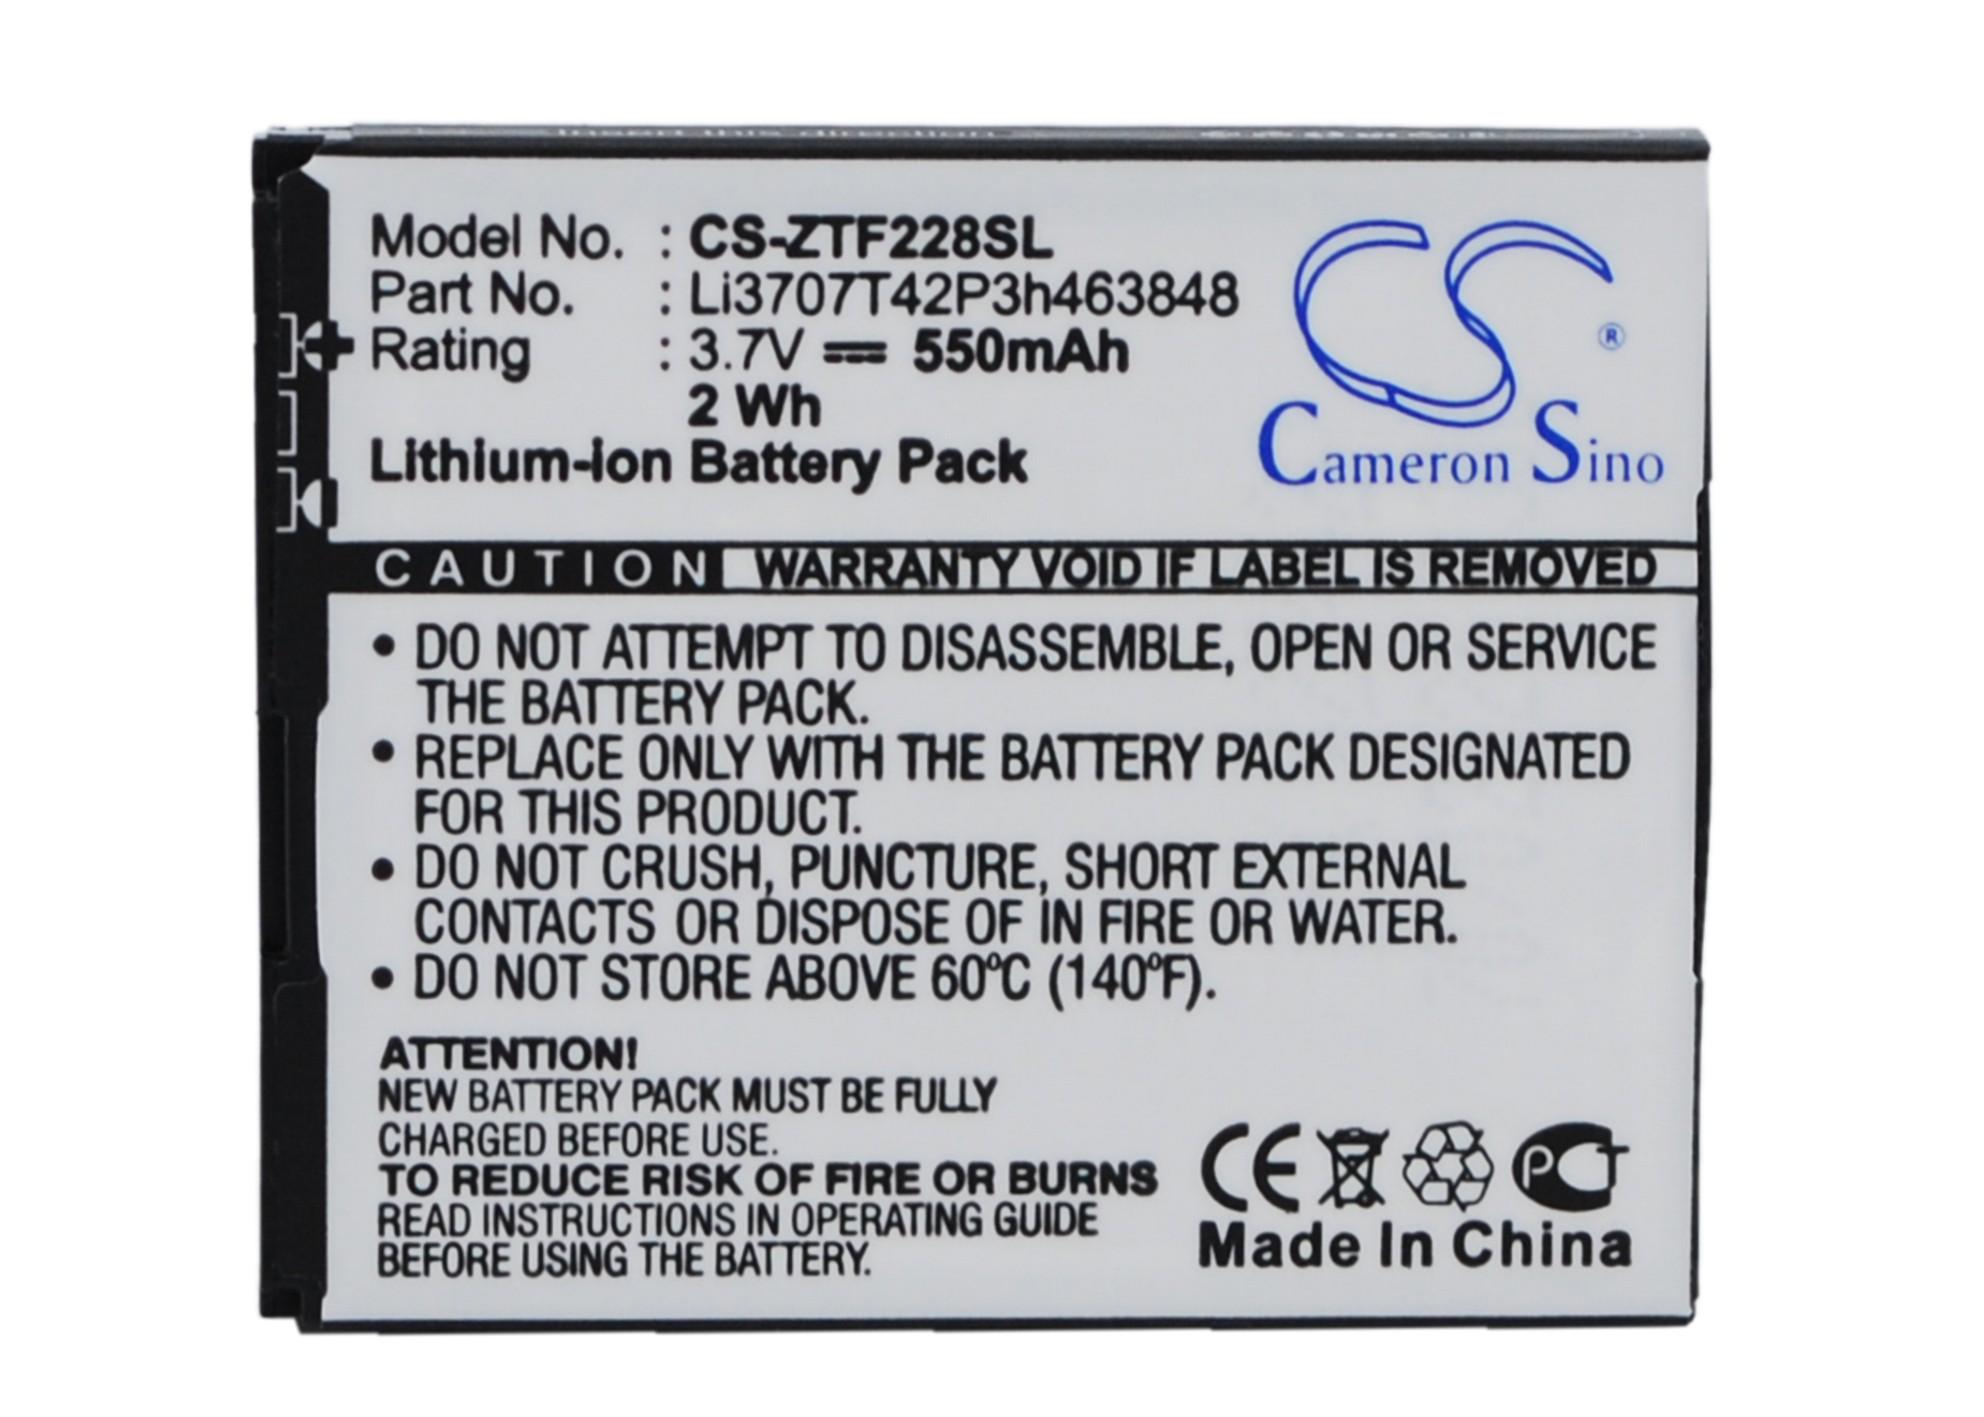 Cameron Sino baterie do mobilů pro VODAFONE VF227 3.7V Li-ion 550mAh černá - neoriginální